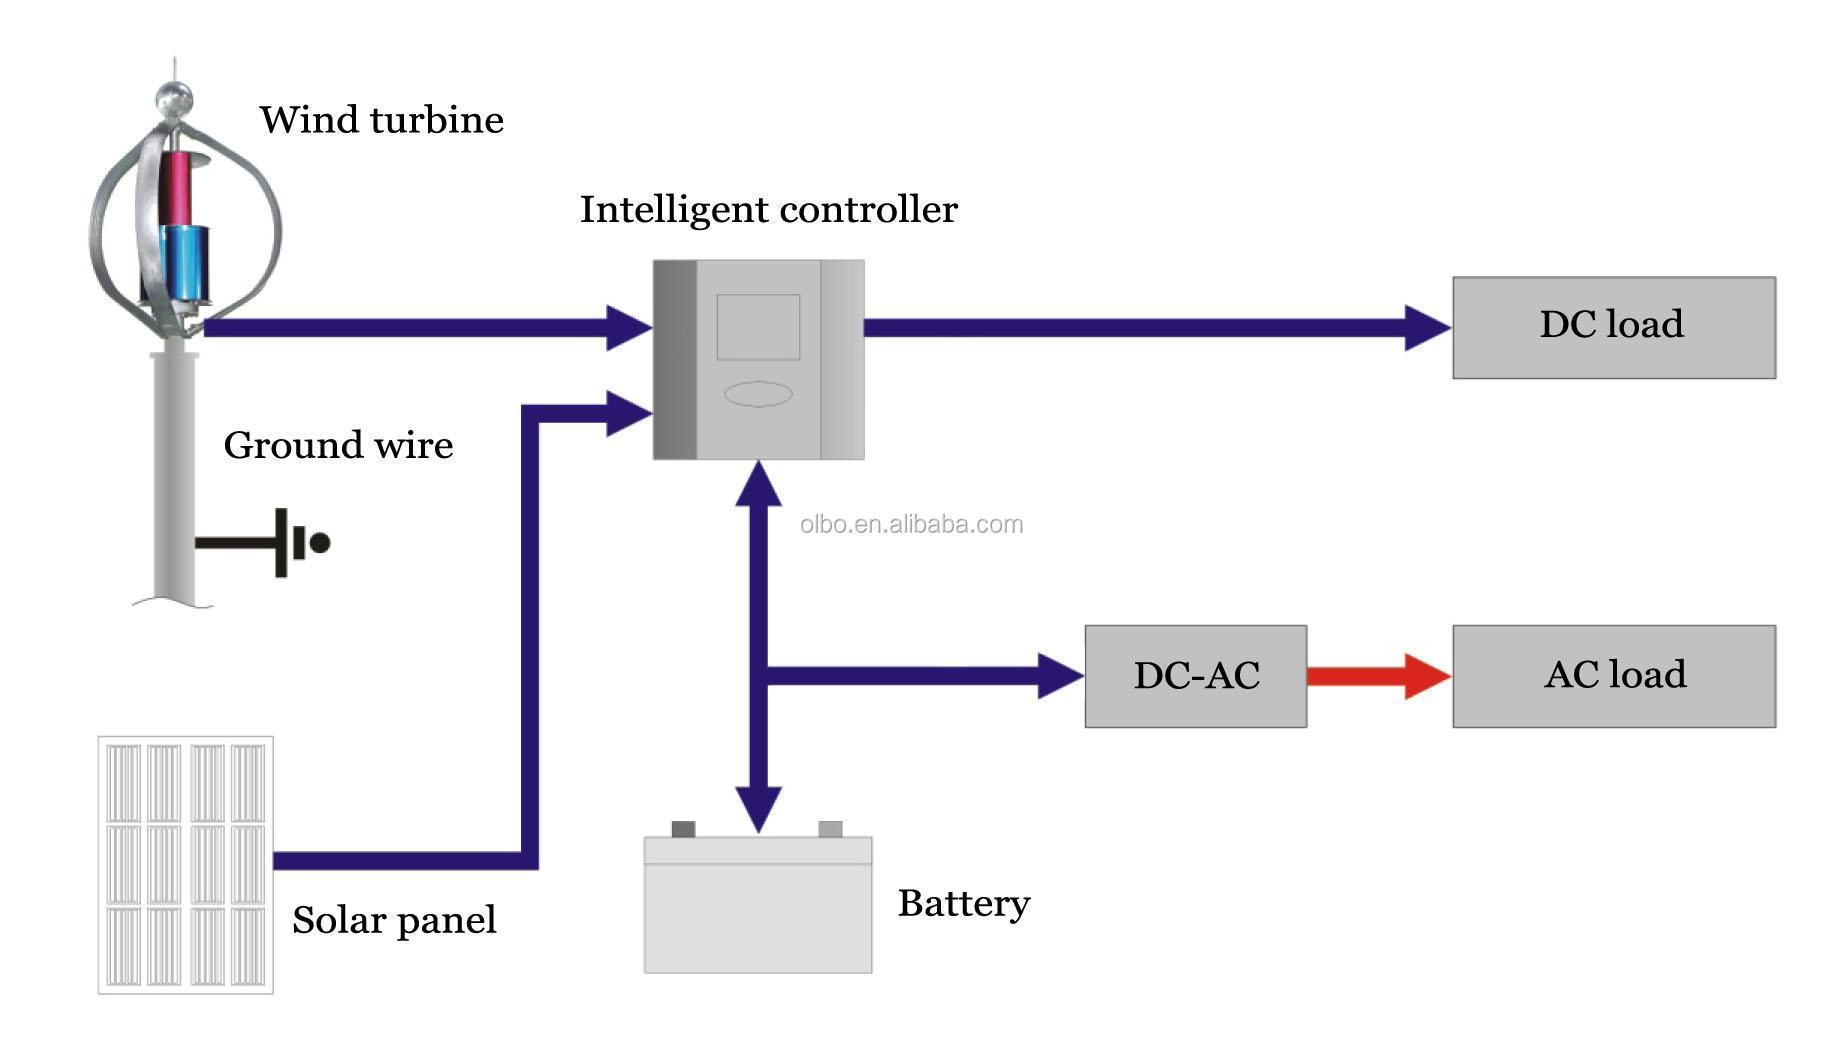 air conditioning wiring diagram as well wind turbine wiring diagram rh abetter pw